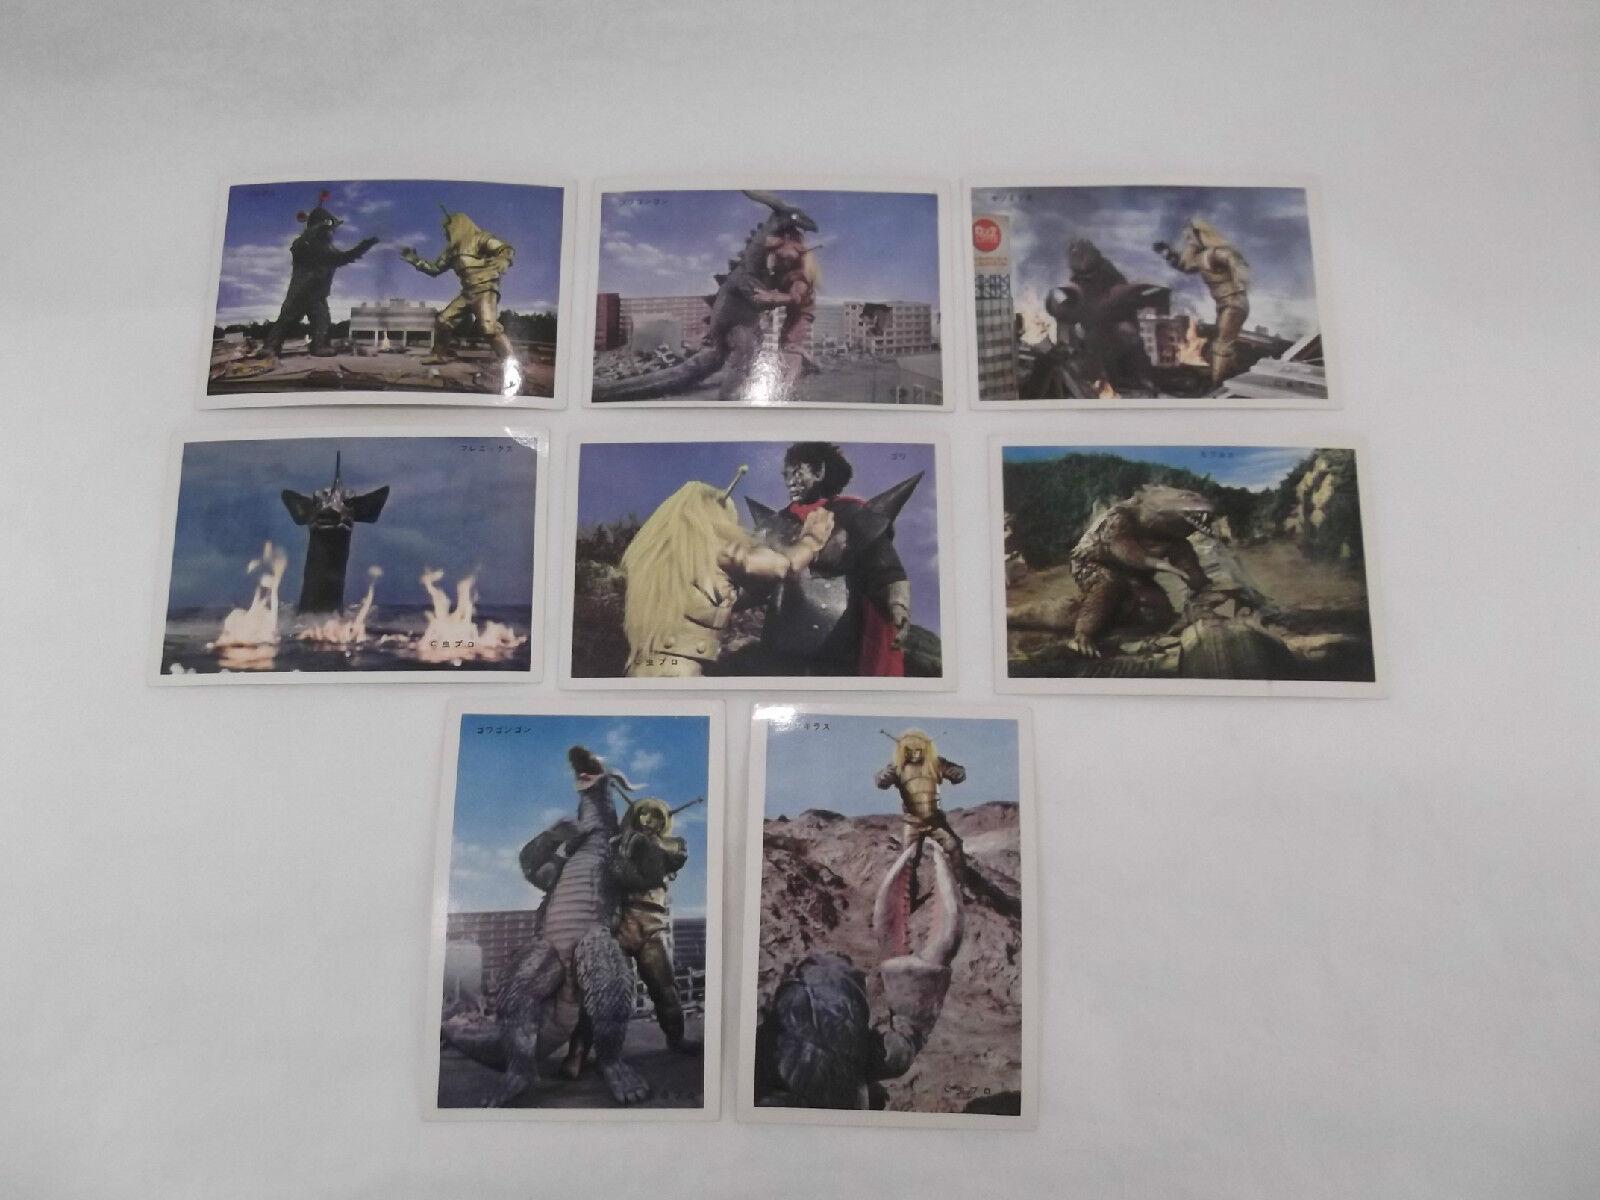 VINTAGE YAMAKATSU MAGMA TAISHI JAPANESE LARGE BROMIDE TRADING CARDS LOT OF 8